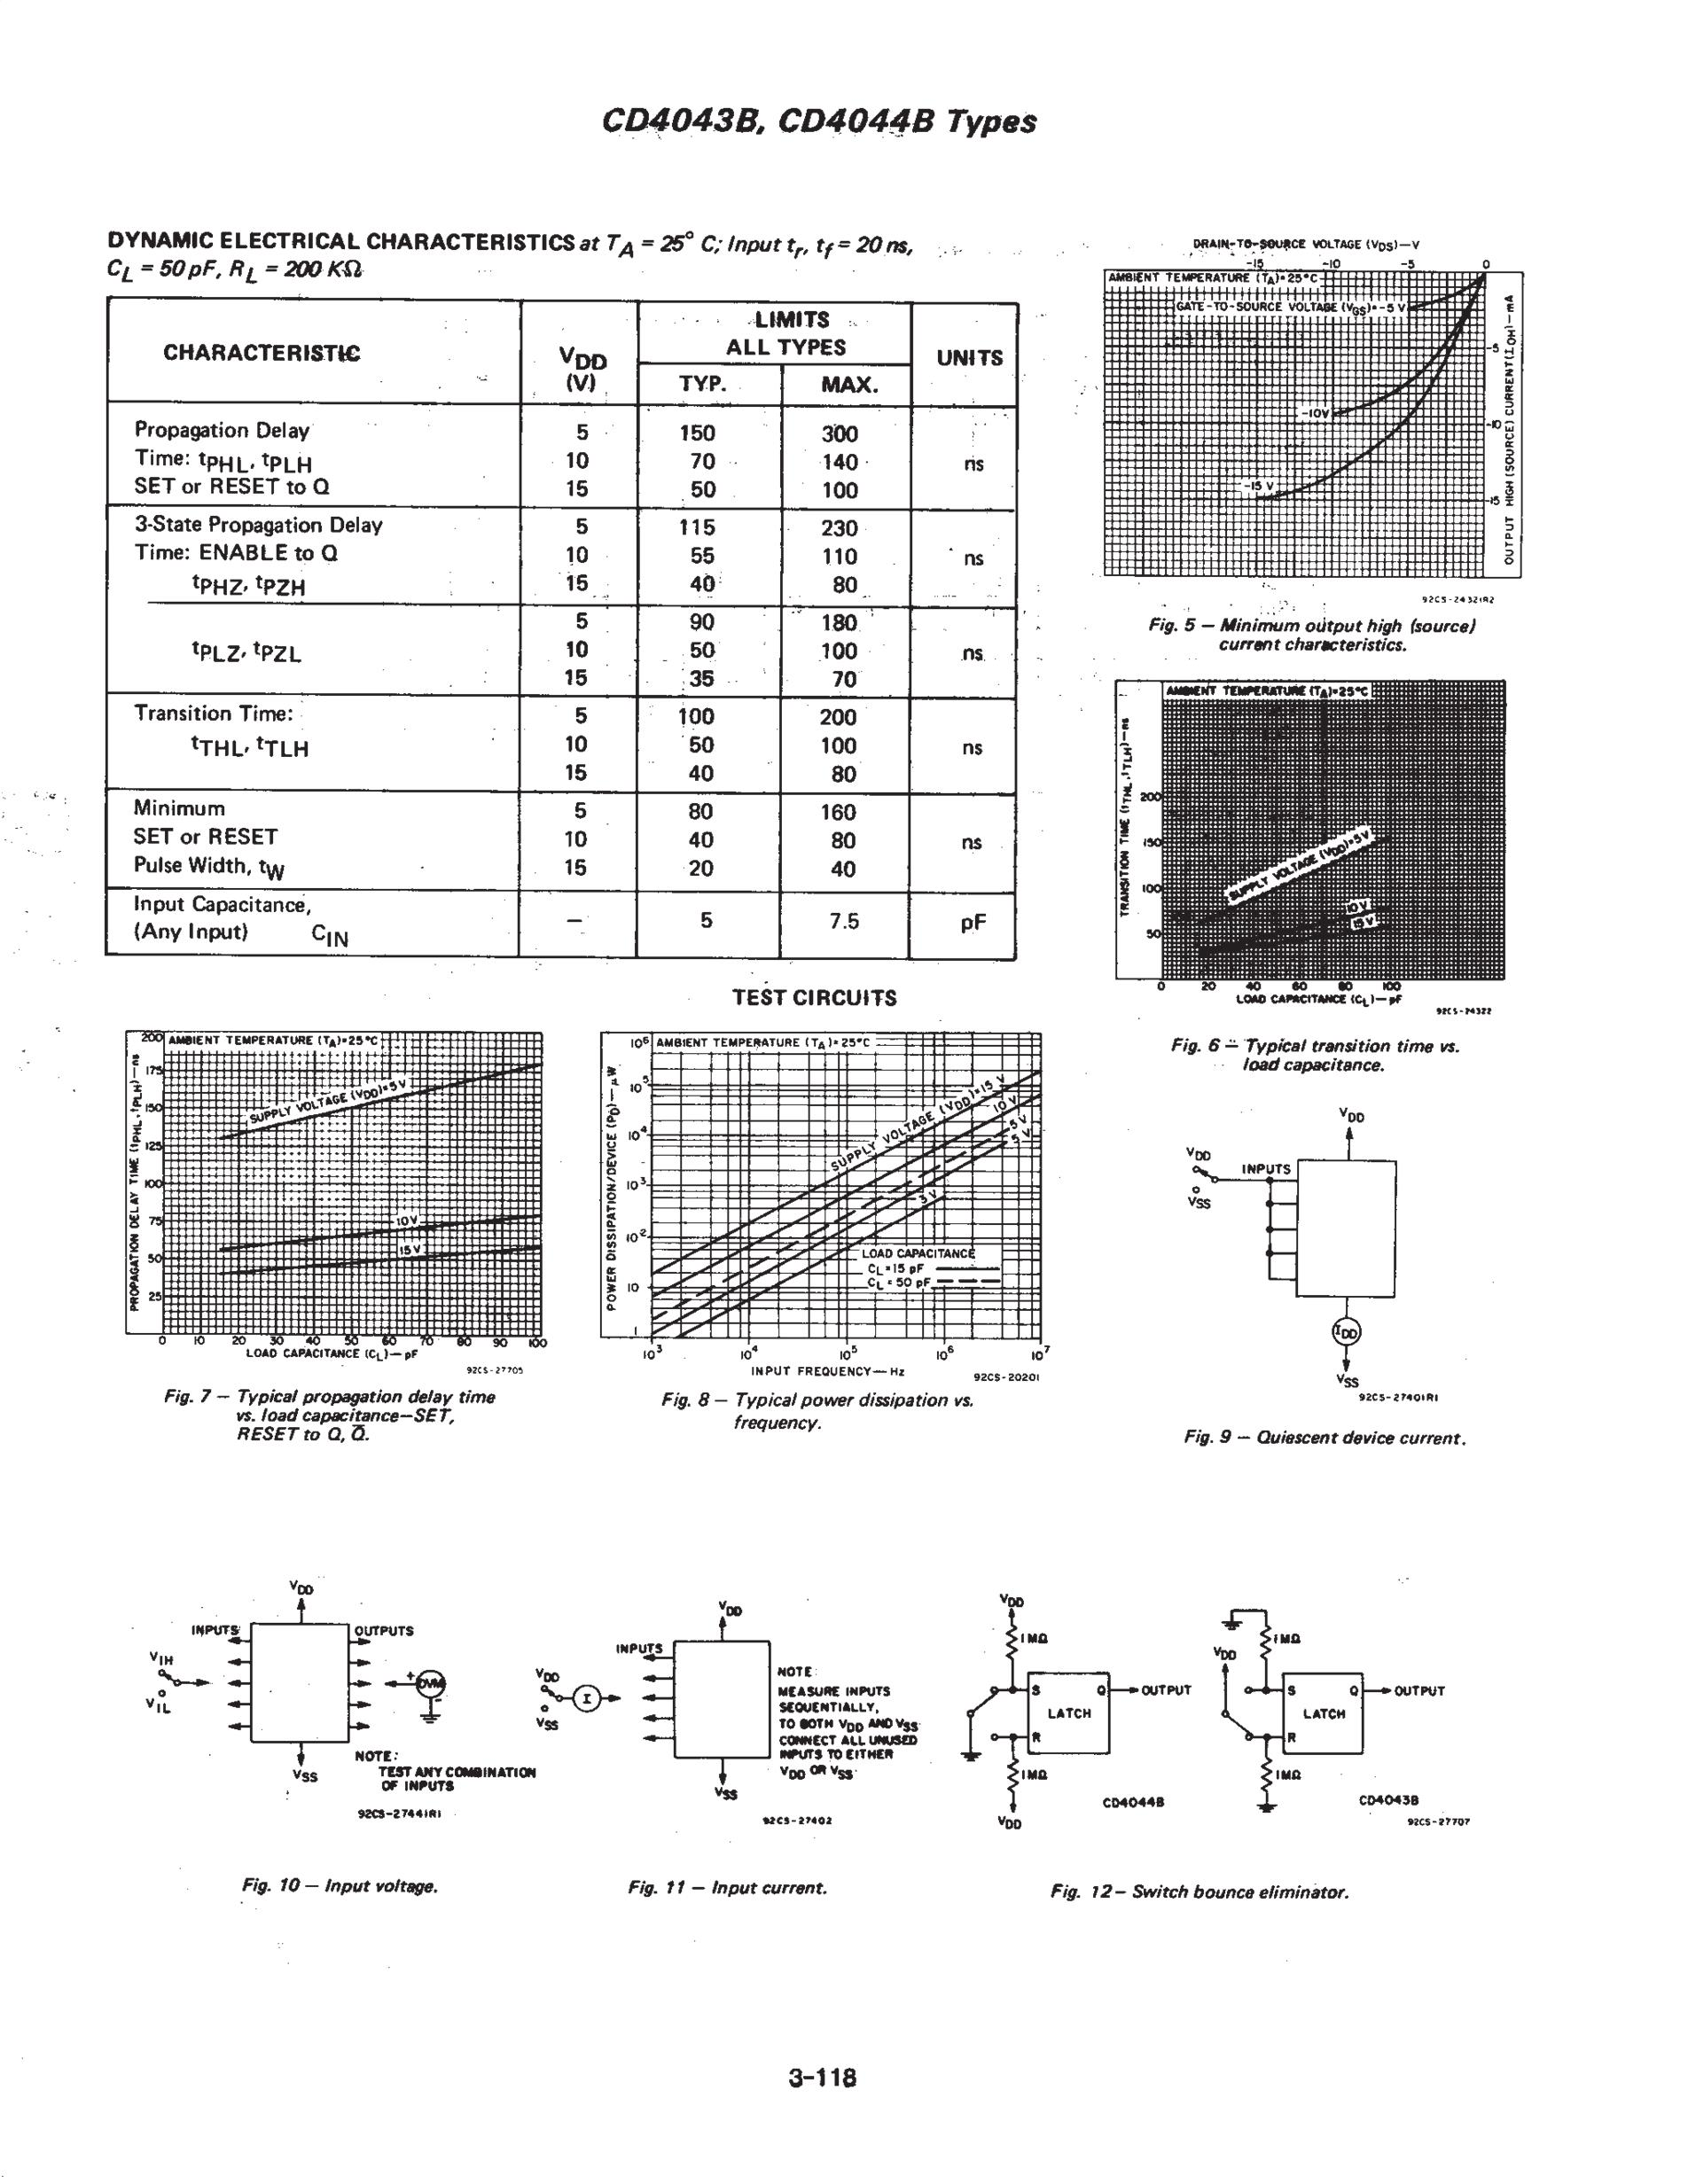 CD4044BDT's pdf picture 3